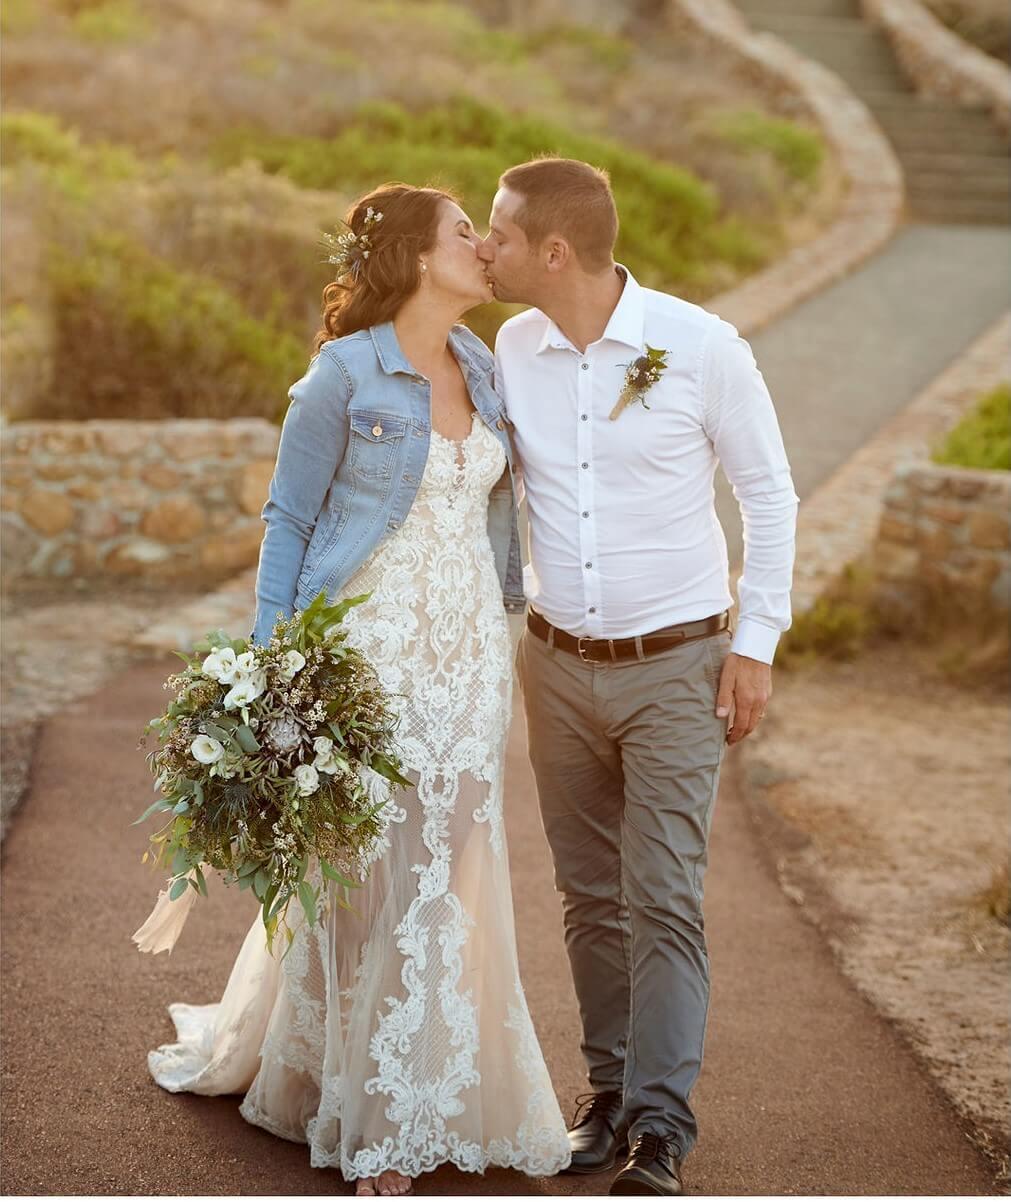 https://www.lovebirdceremonies.com.au/wp-content/uploads/2020/07/4.1-Denim-Jacket-Eva-Rene.jpg